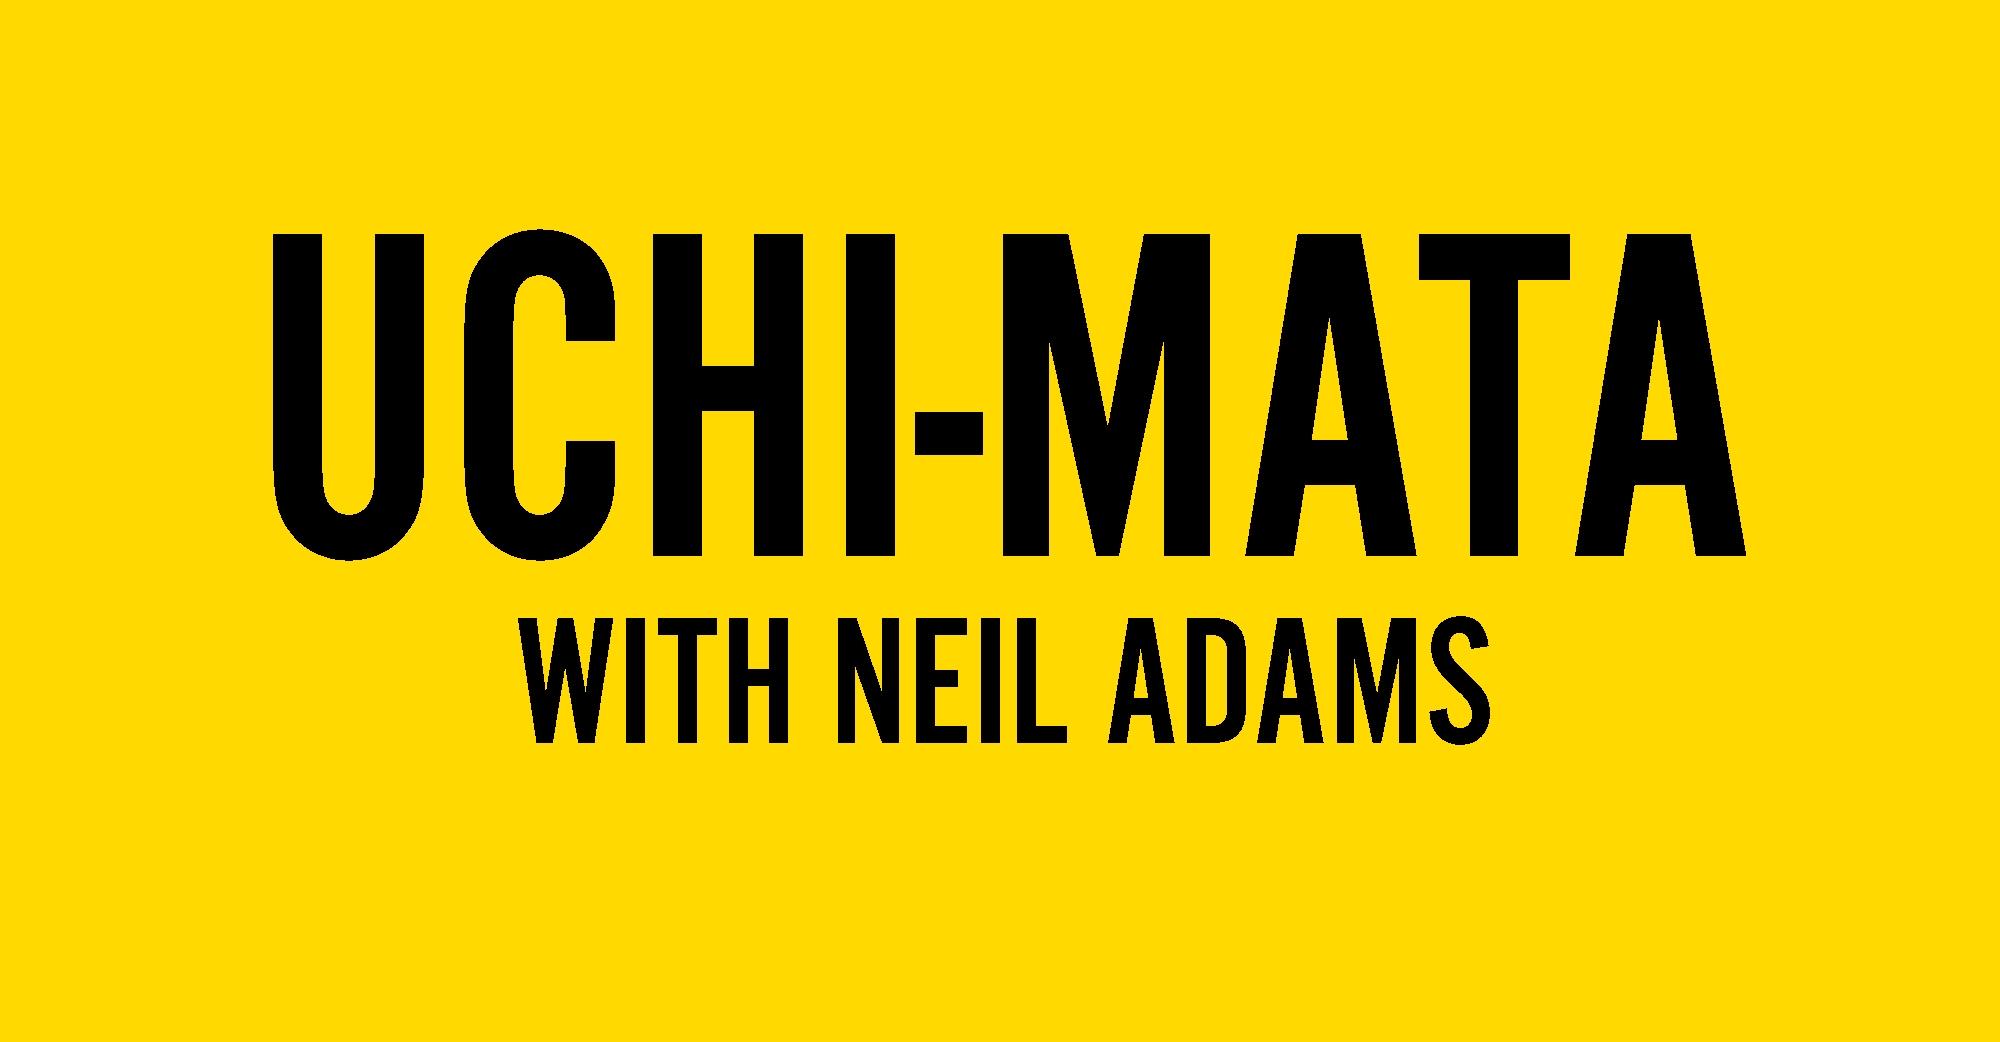 Neil Adams Uchimata